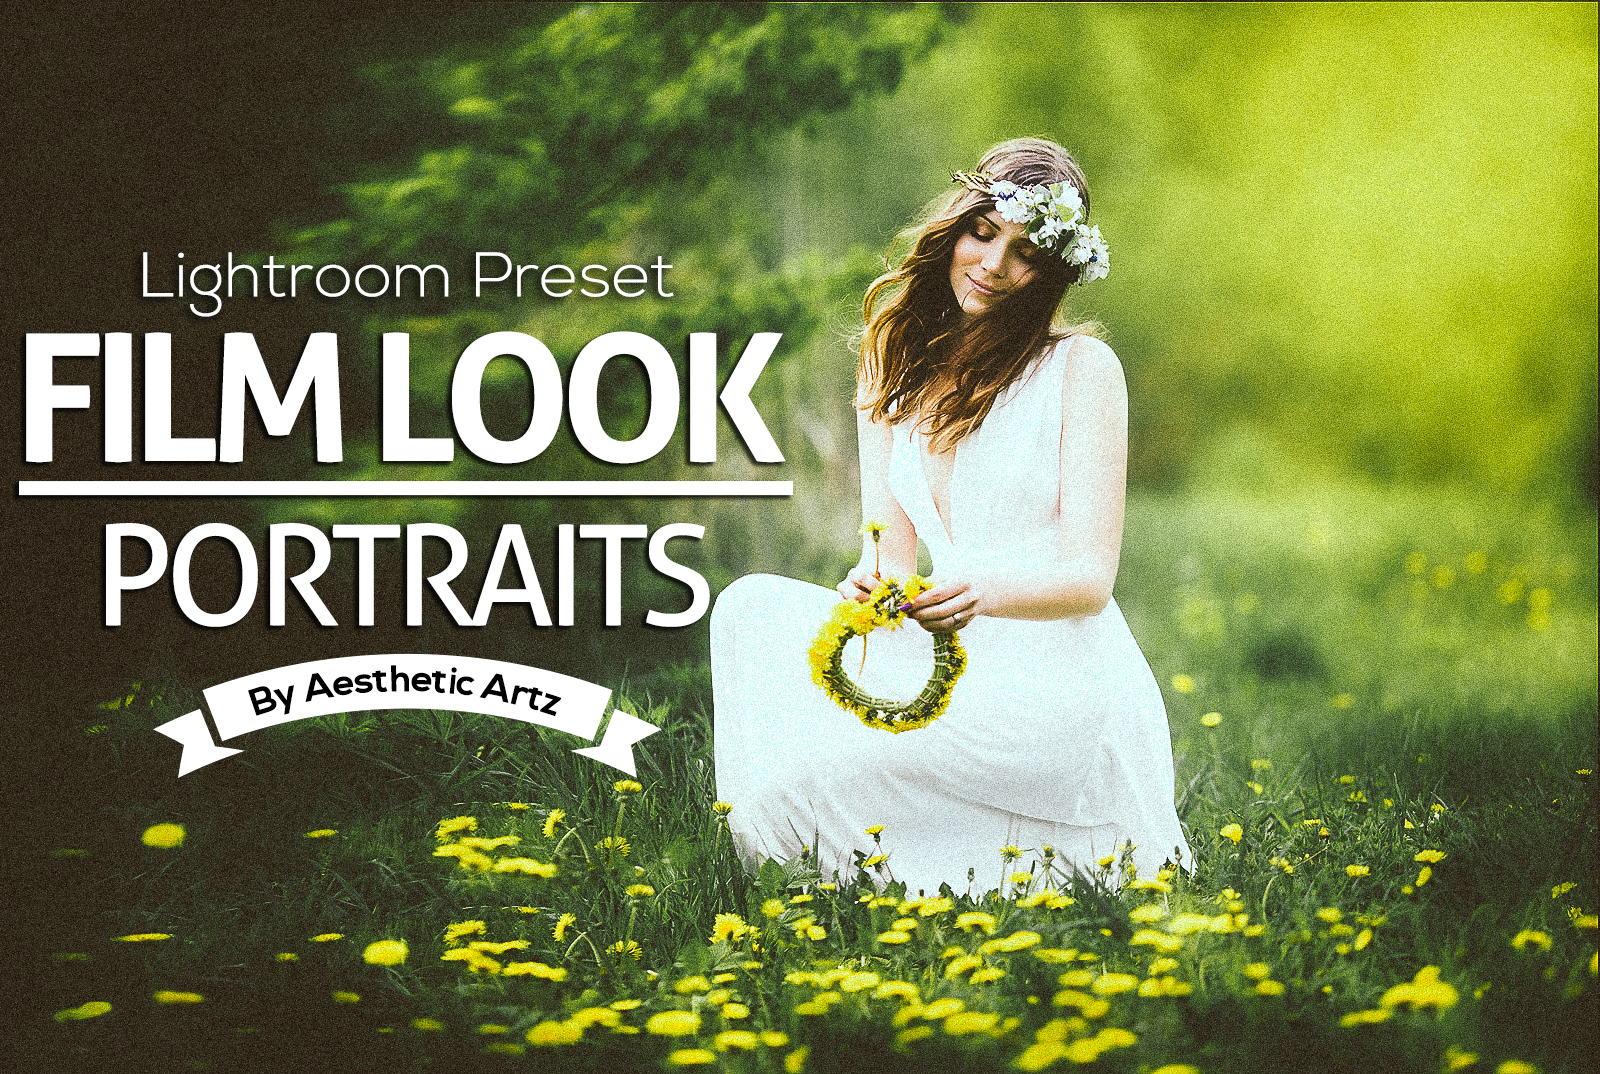 Premium FILM LOOK Portraits Lightroom Preset by